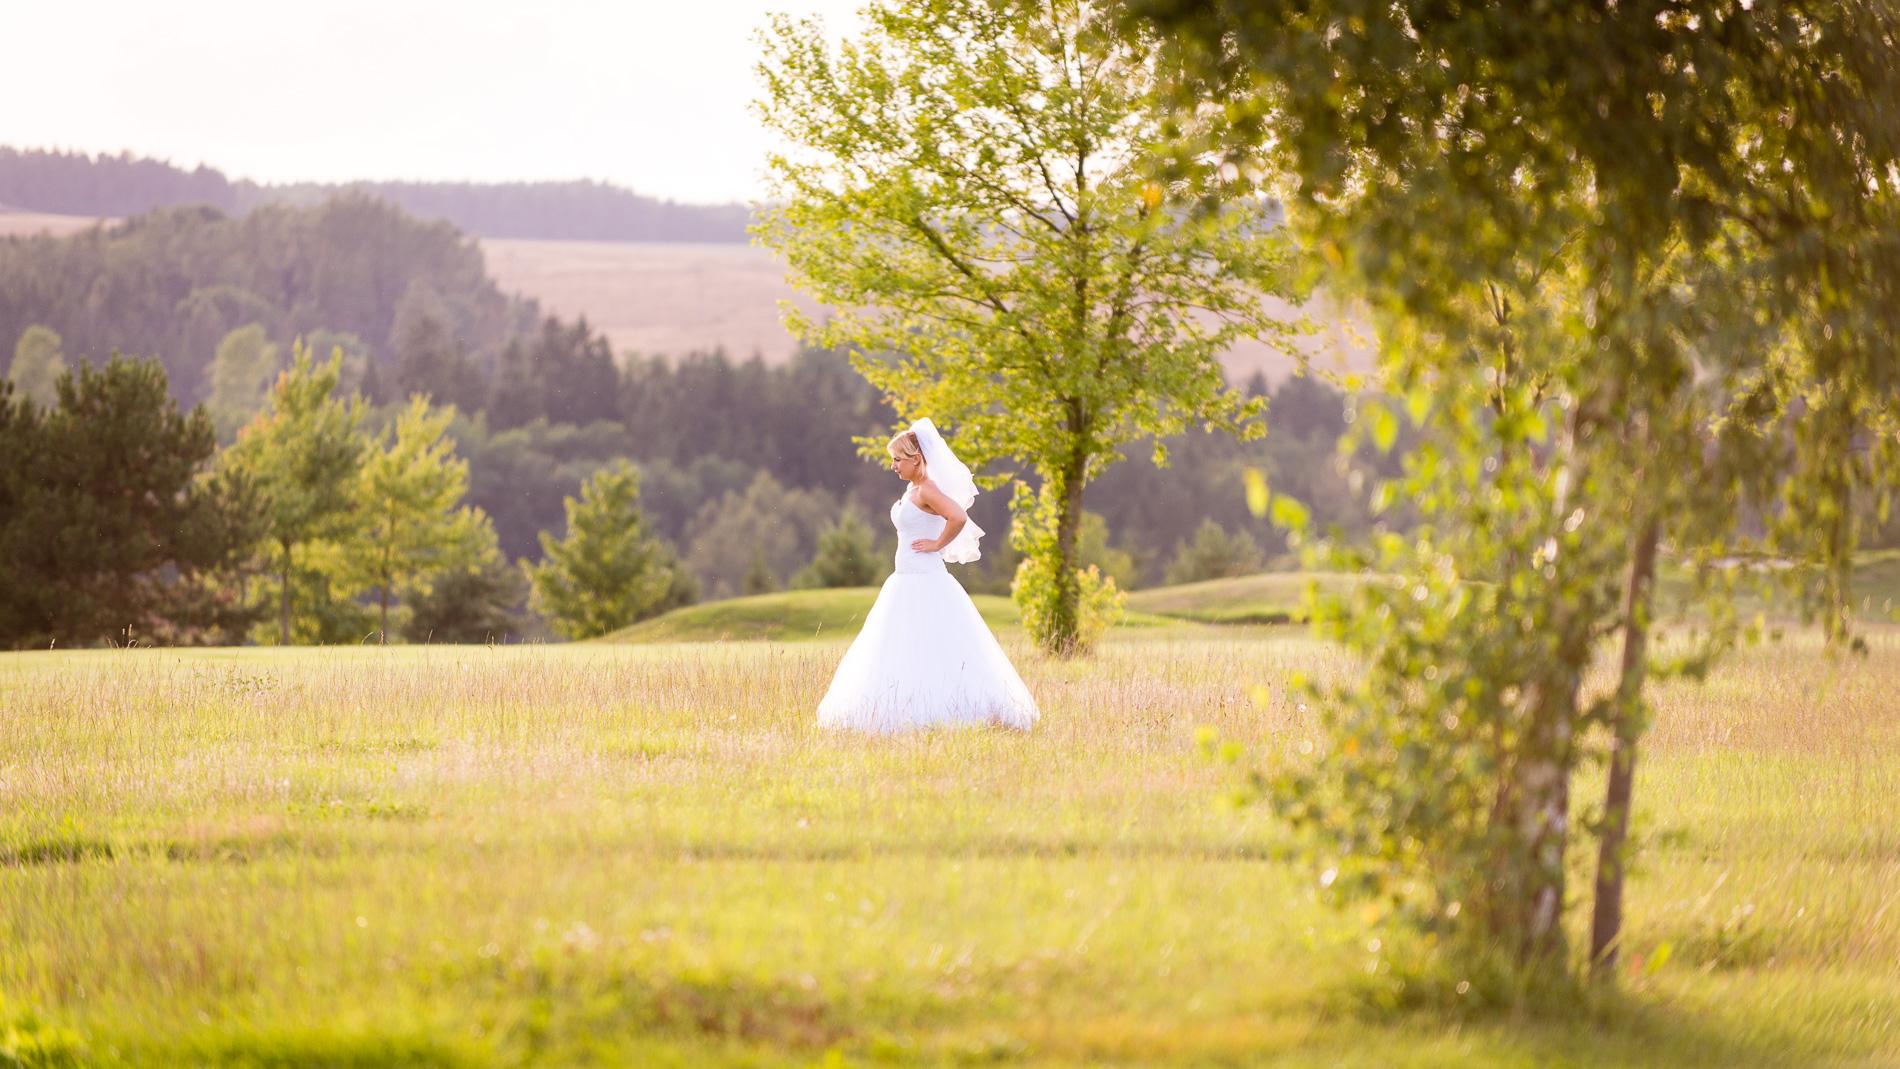 Svatební fotografie, svatební fotograf Filip Komorous, www.filipfotograf.cz